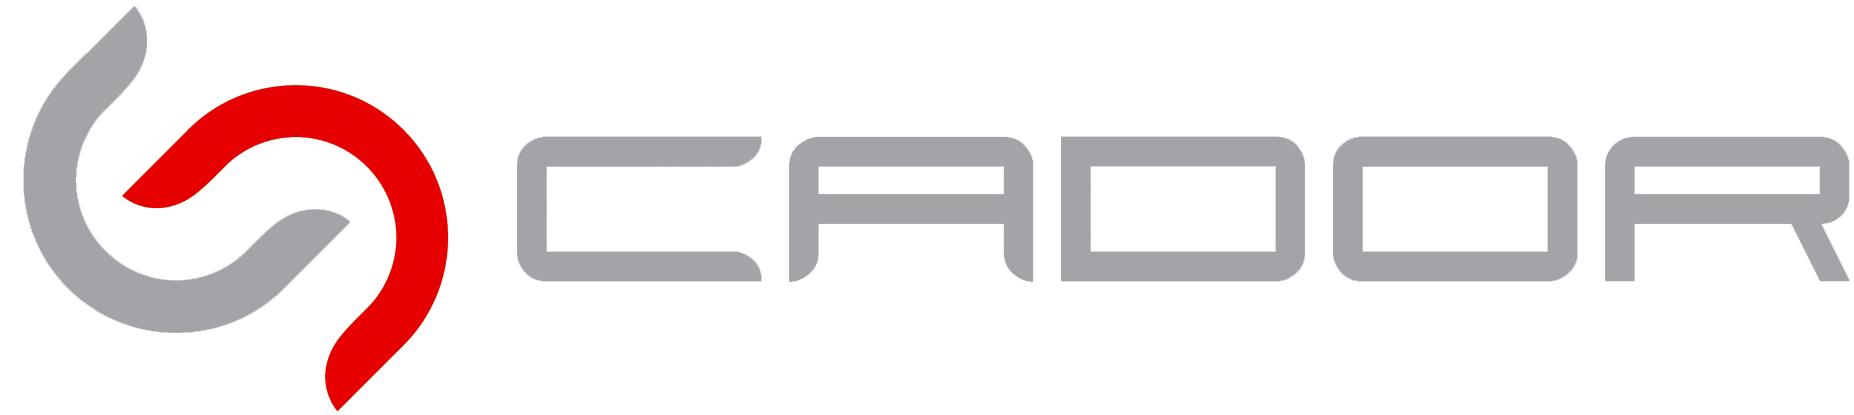 Logo Cador Consulting